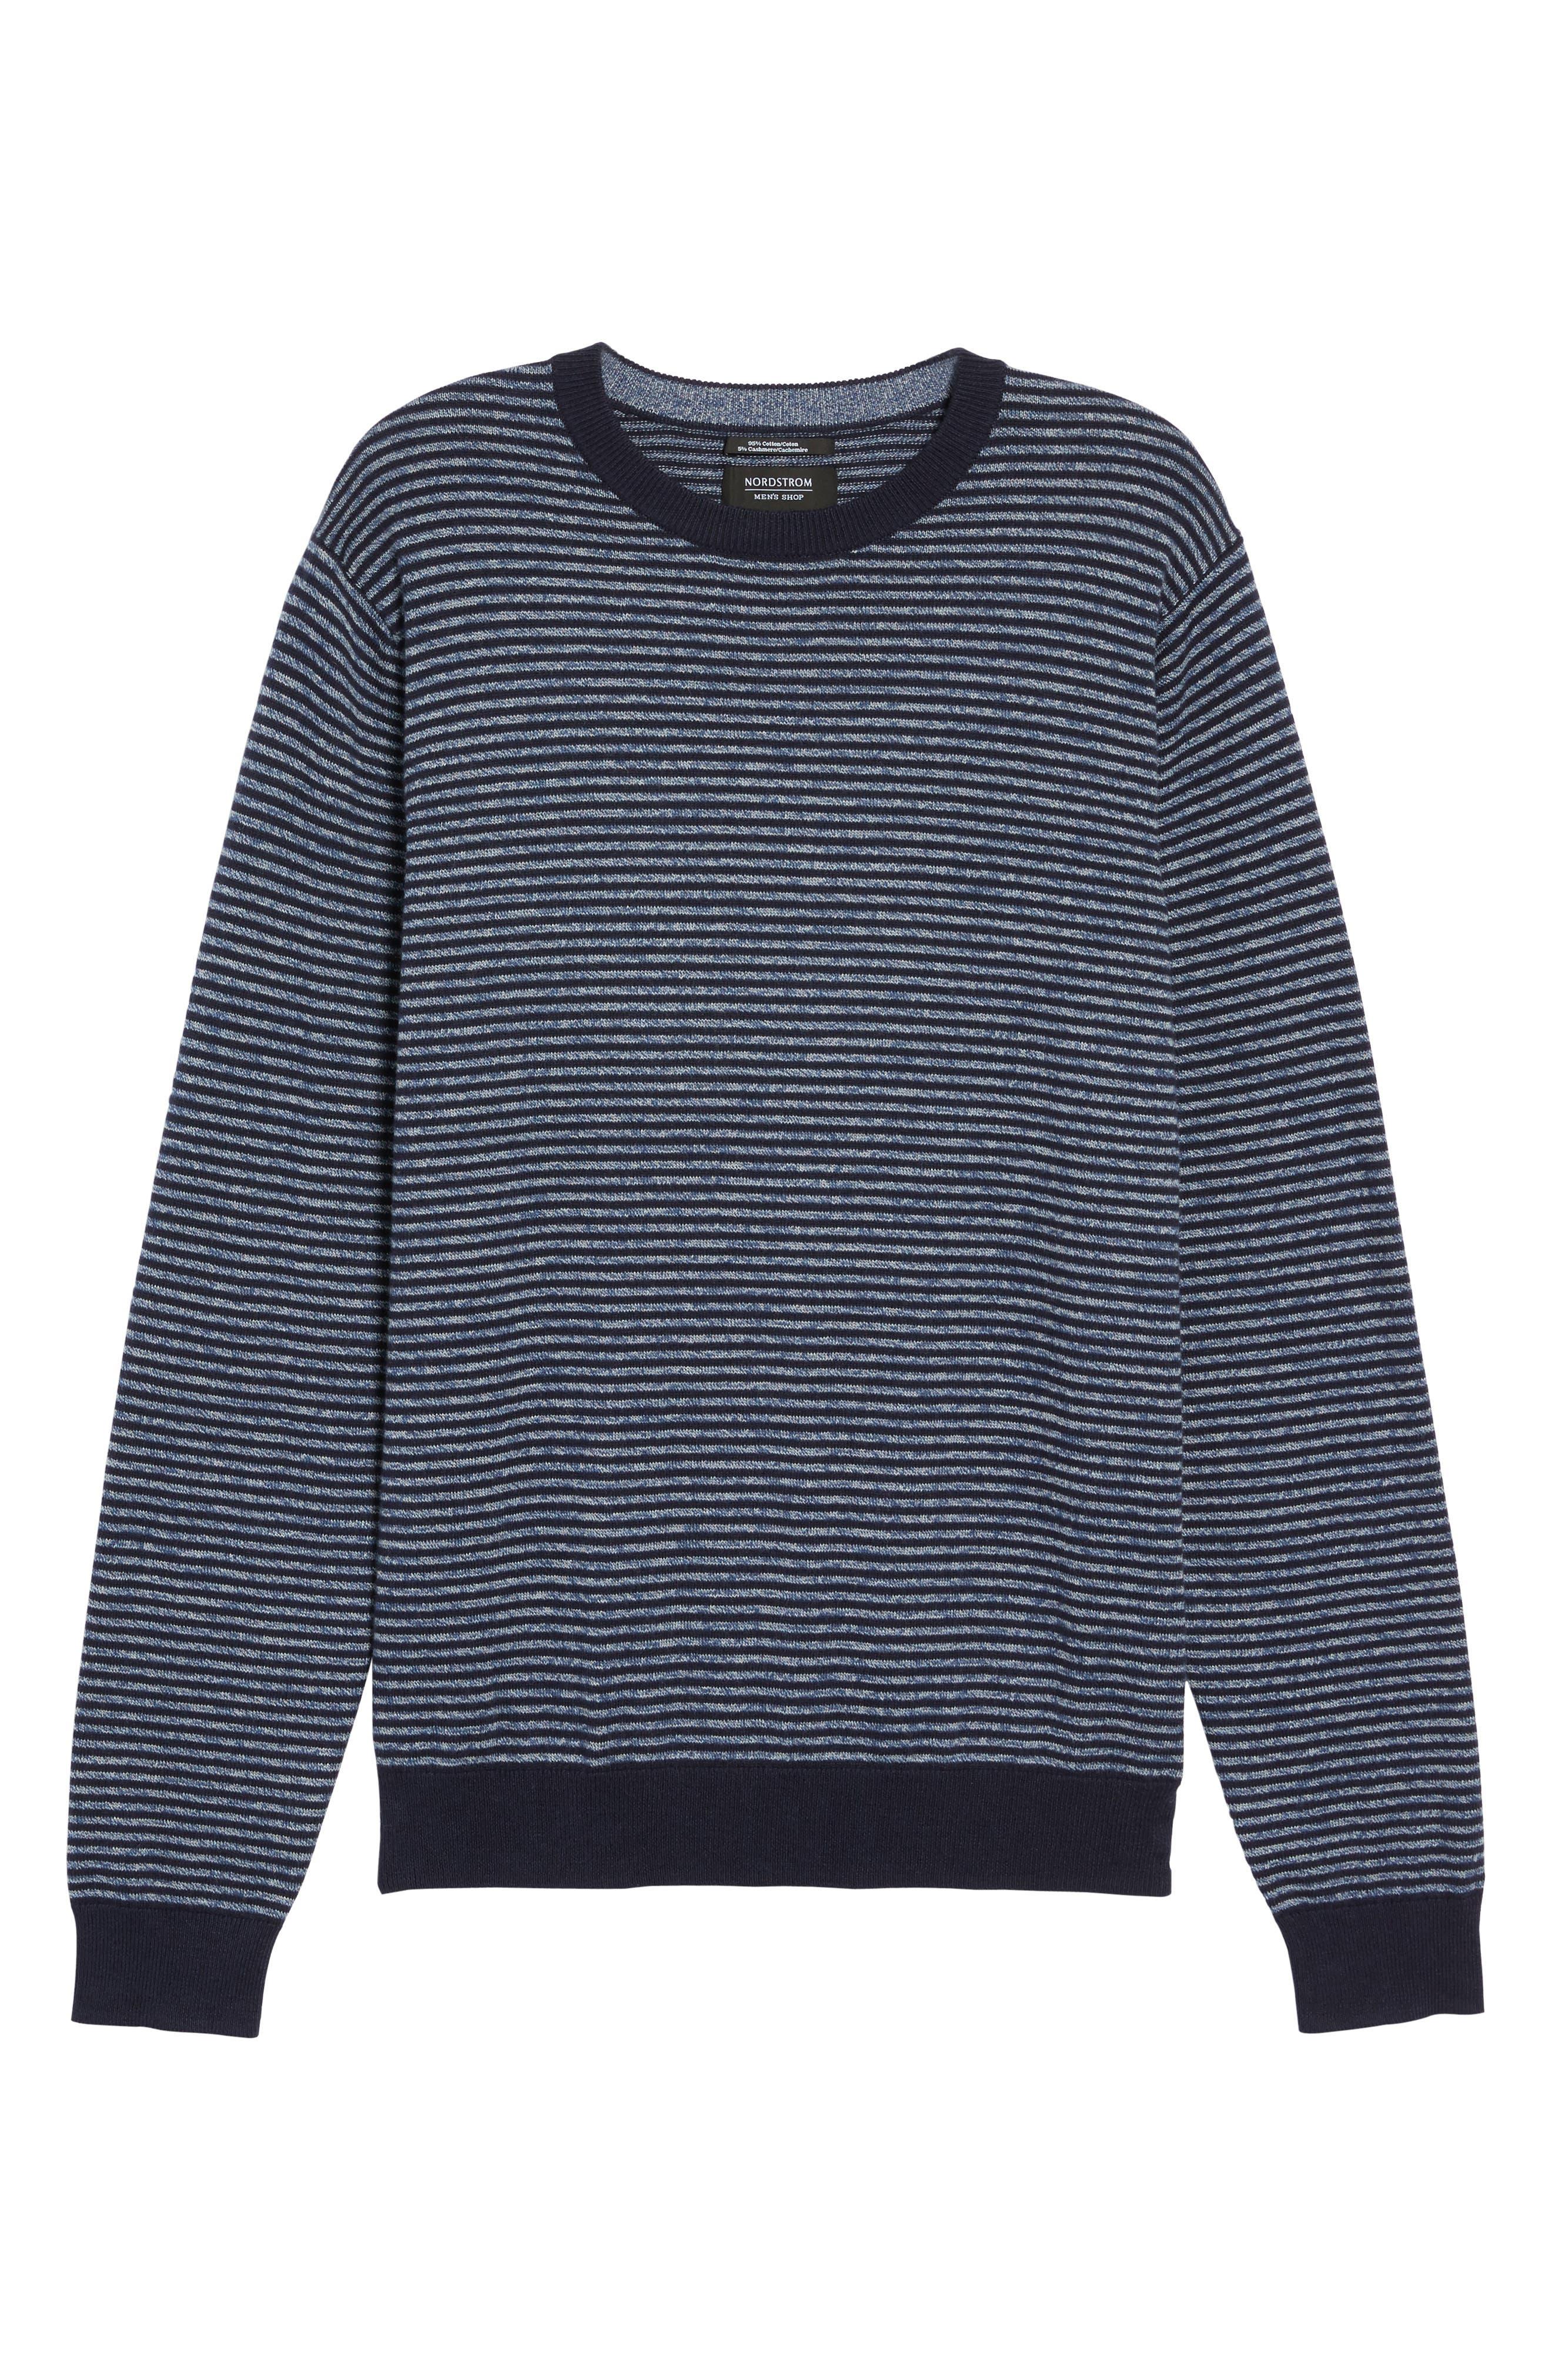 Stripe Cotton & Cashmere Crewneck Sweater,                             Alternate thumbnail 6, color,                             Navy Iris Jaspe Stripe